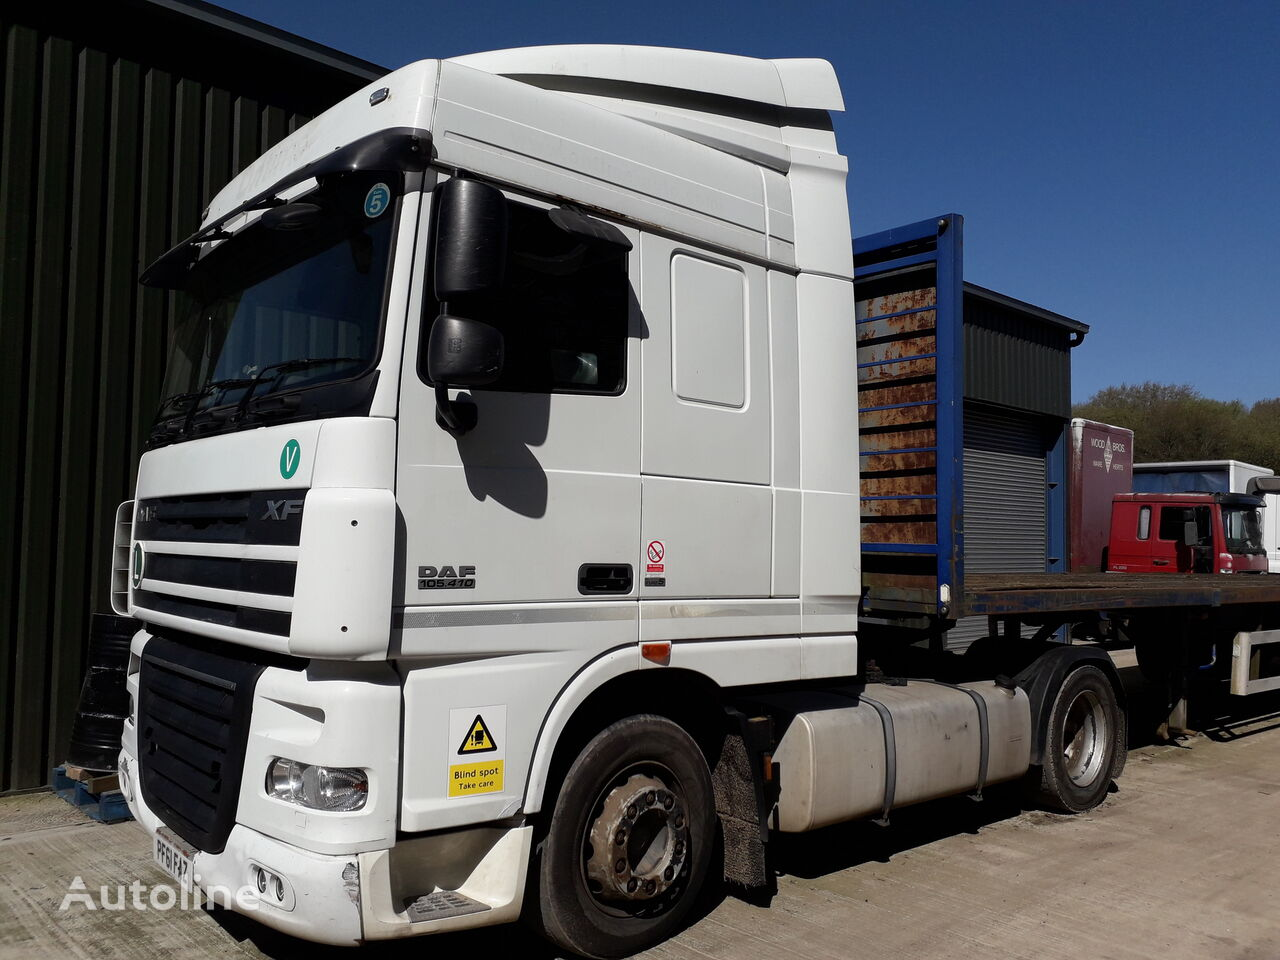 DAF FTXF105 tractor unit